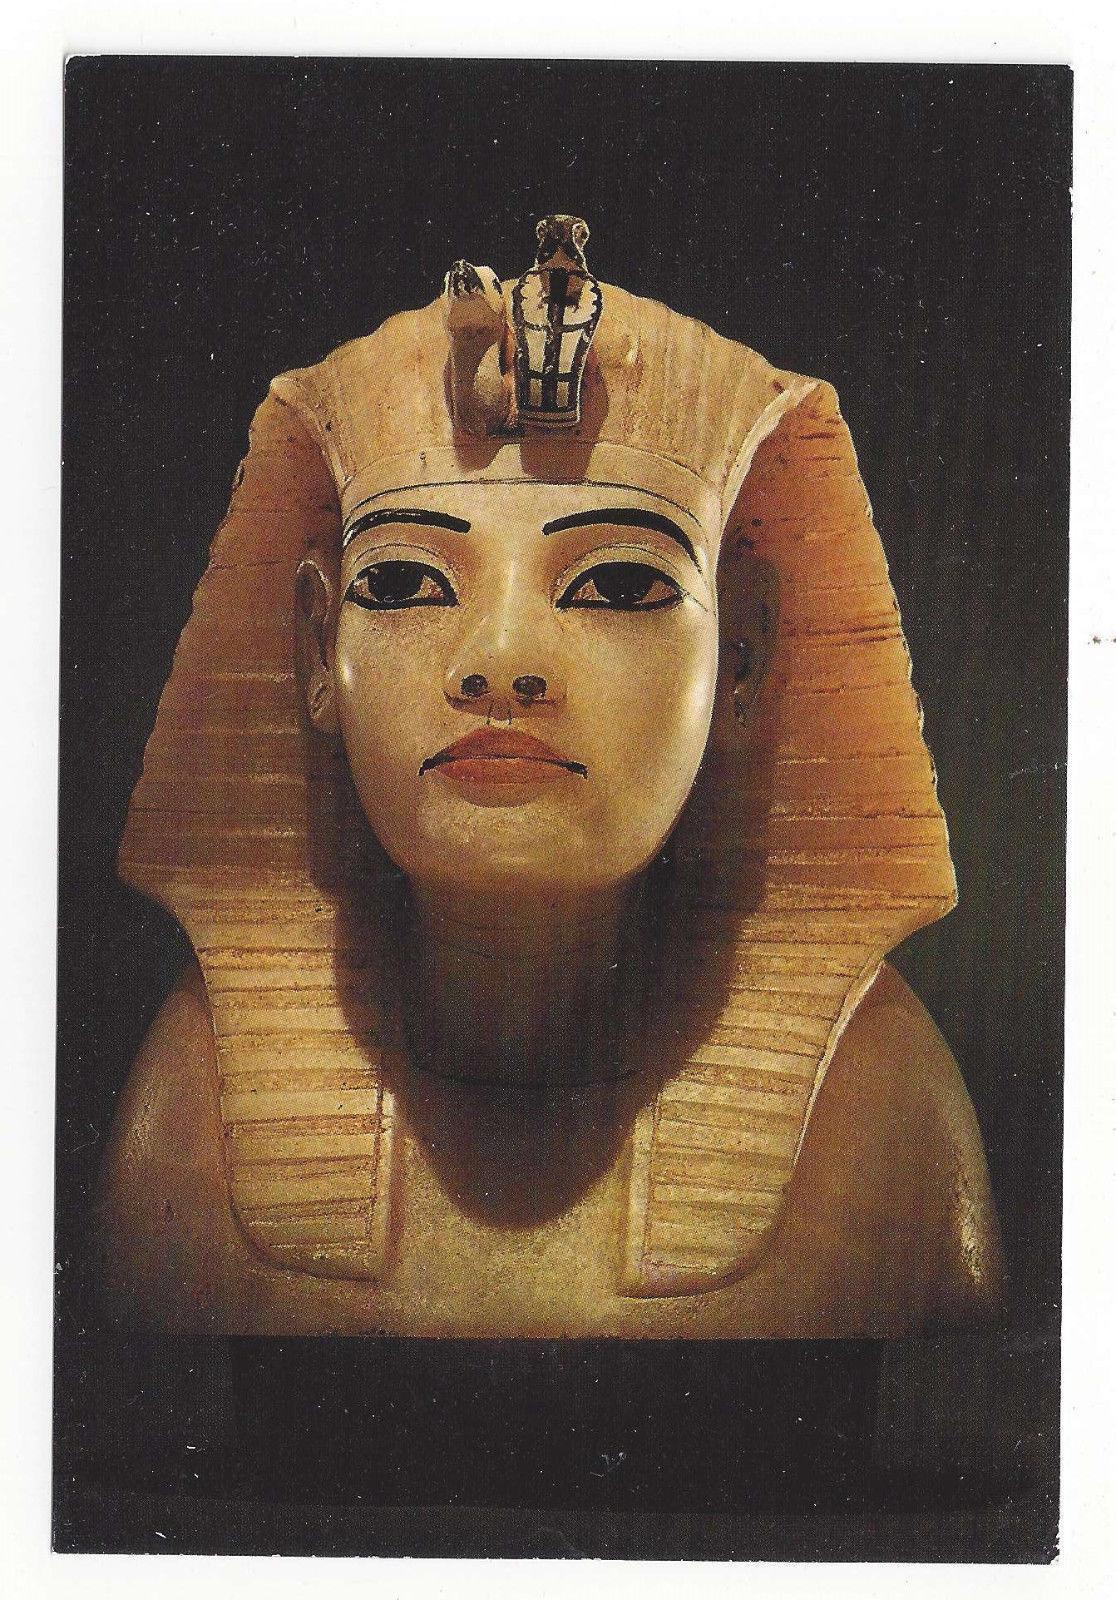 Treasures of Tutankhamen Egyptian Art Postcard 4X6 Stopper from Canopic Chest